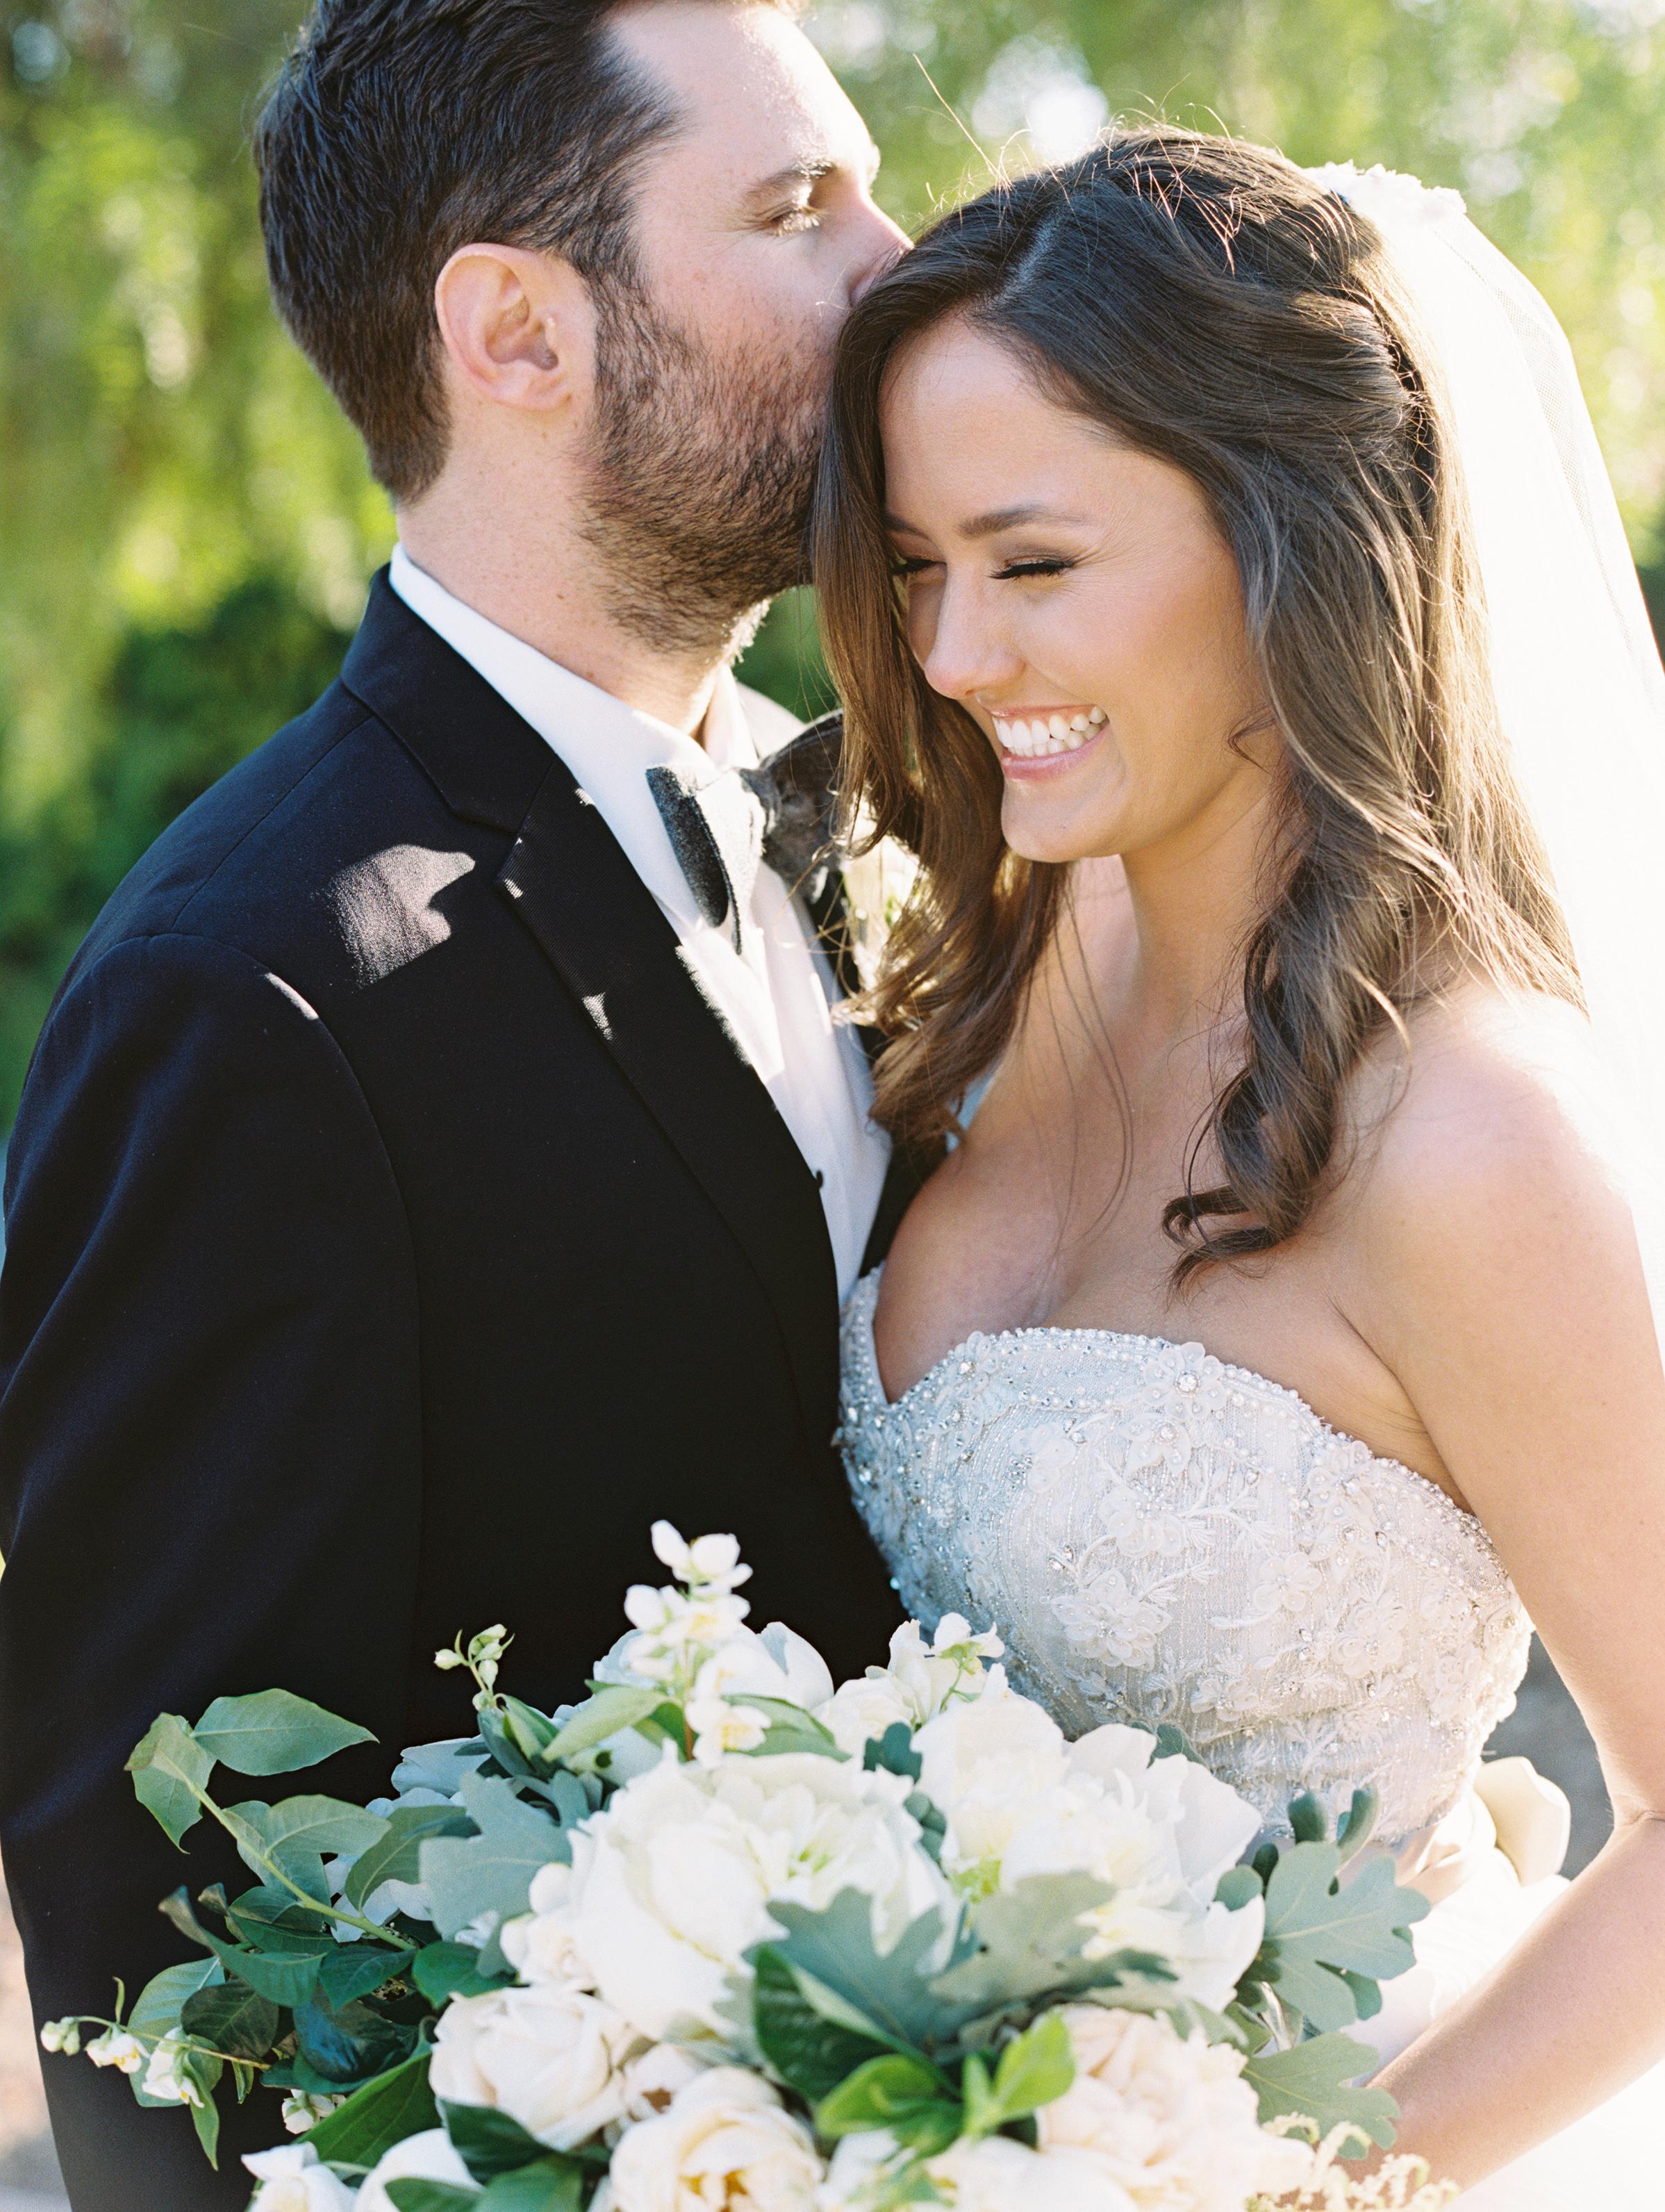 www.santabarbarawedding.com   Magnolia Event Design   Pat Moyer Wedding Photography   Bride and Groom